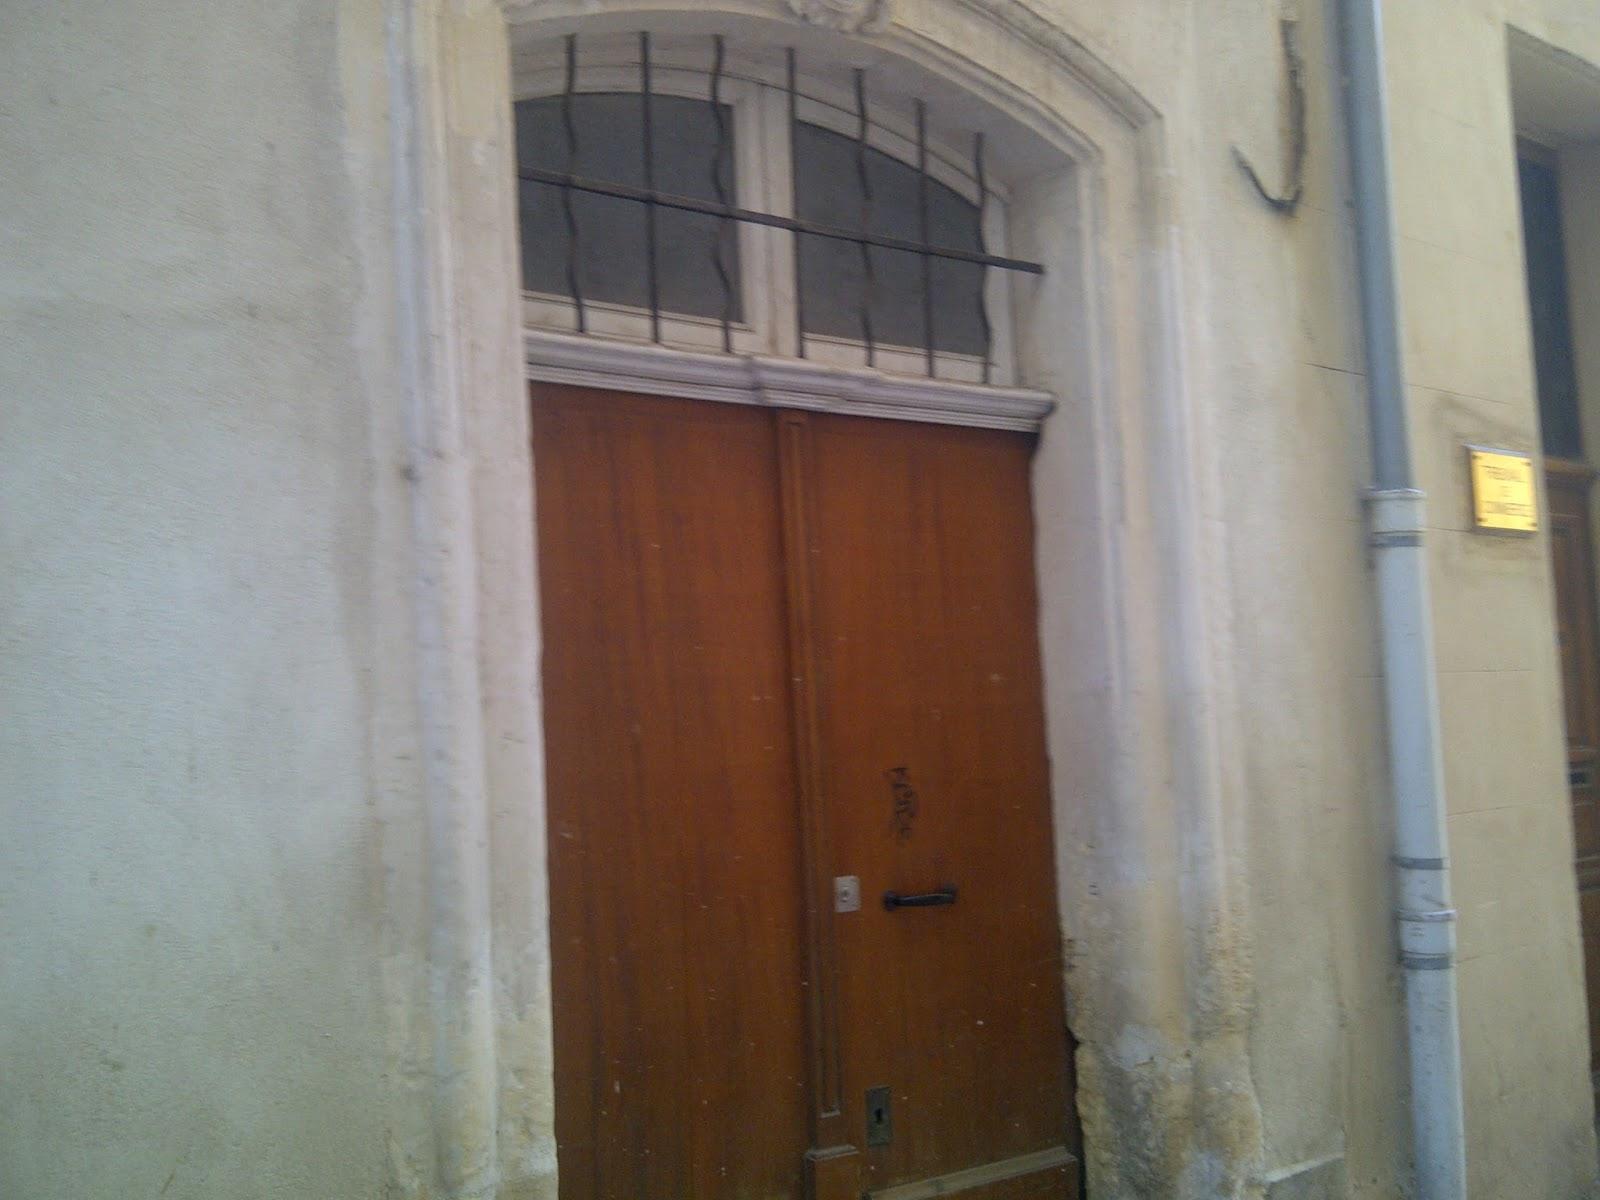 Greffe tribunal de commerce de tarascon 13150 mafia - Greffe du tribunal de commerce de salon de provence ...